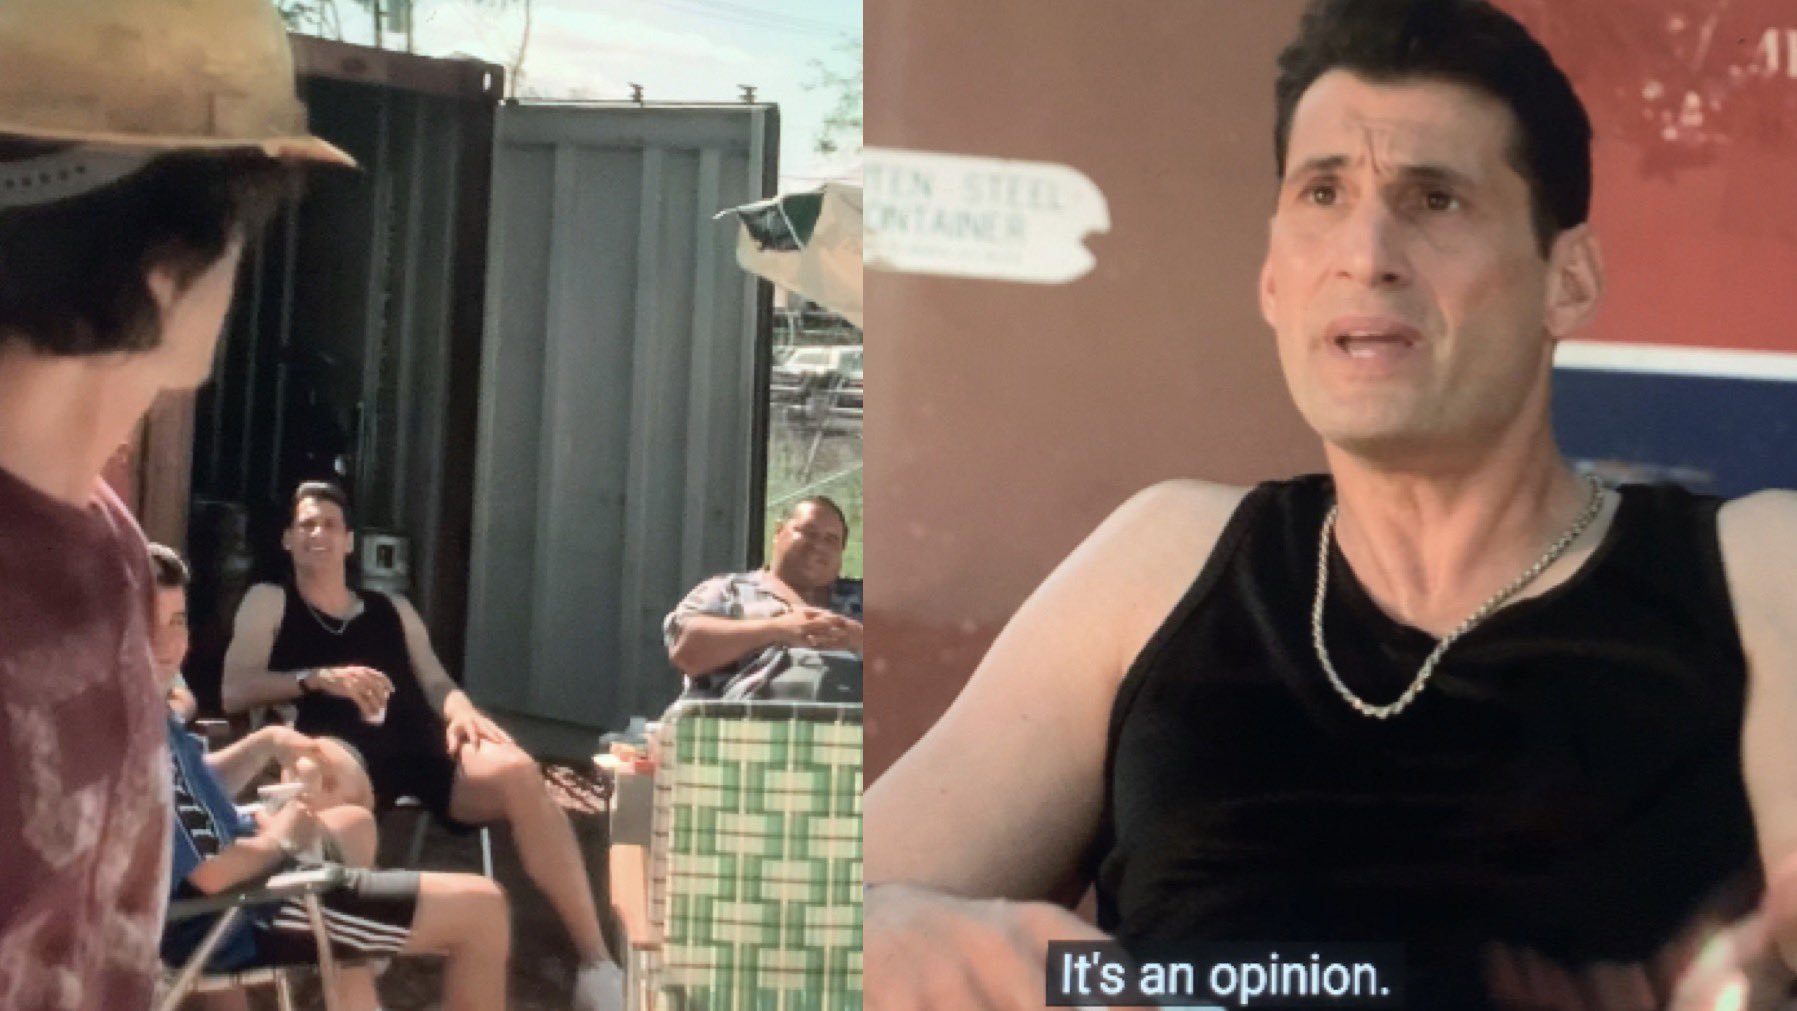 Eugene Pontecorvo is asking Finn DeTrolio for his opinion.